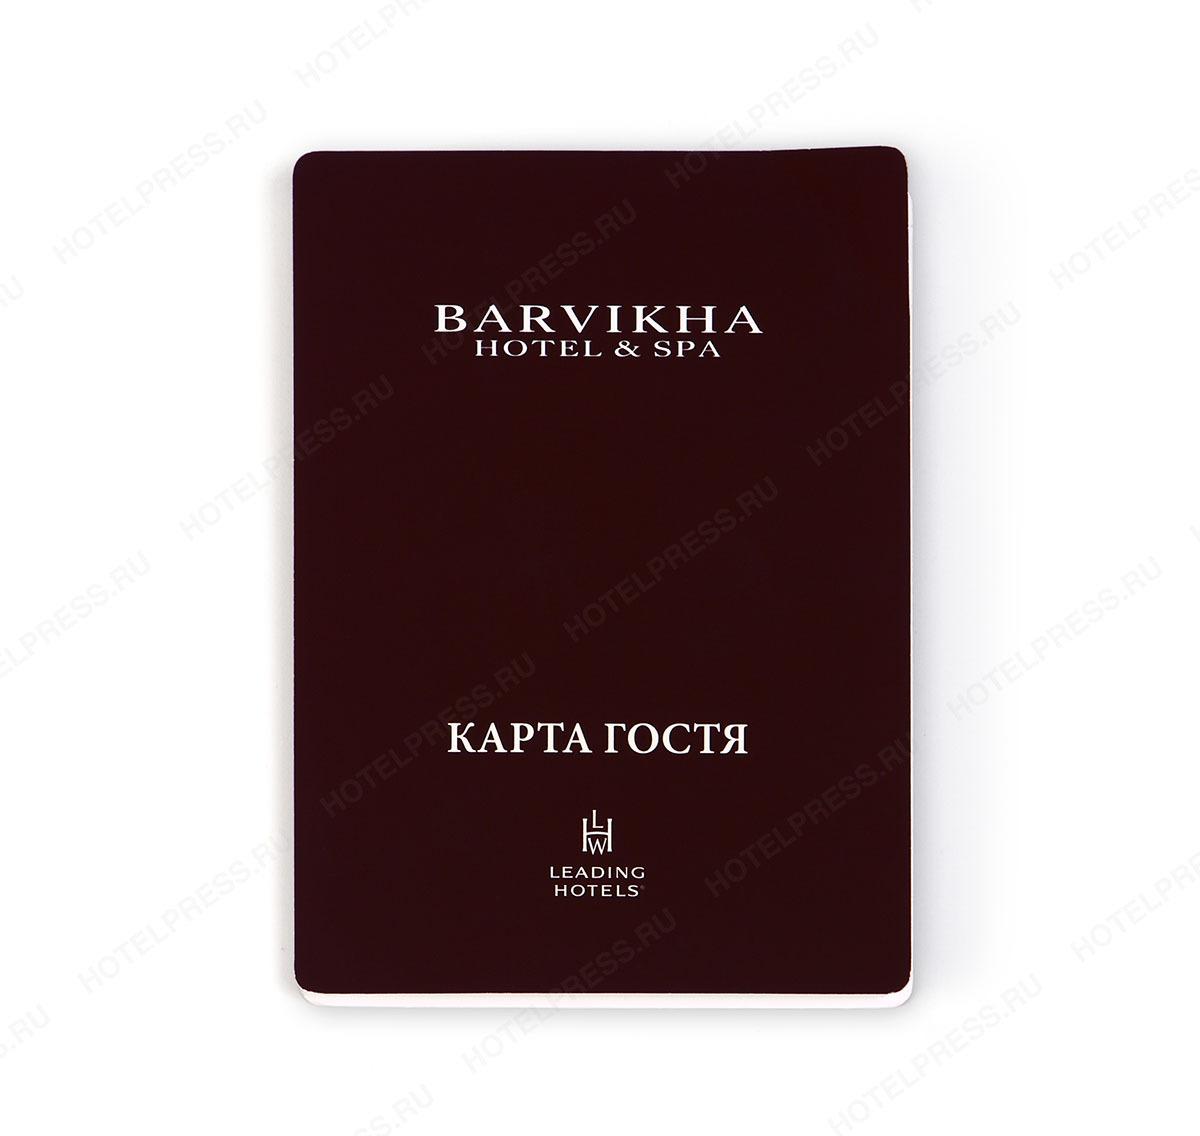 Z-карта гостя отеля BARVIKHA